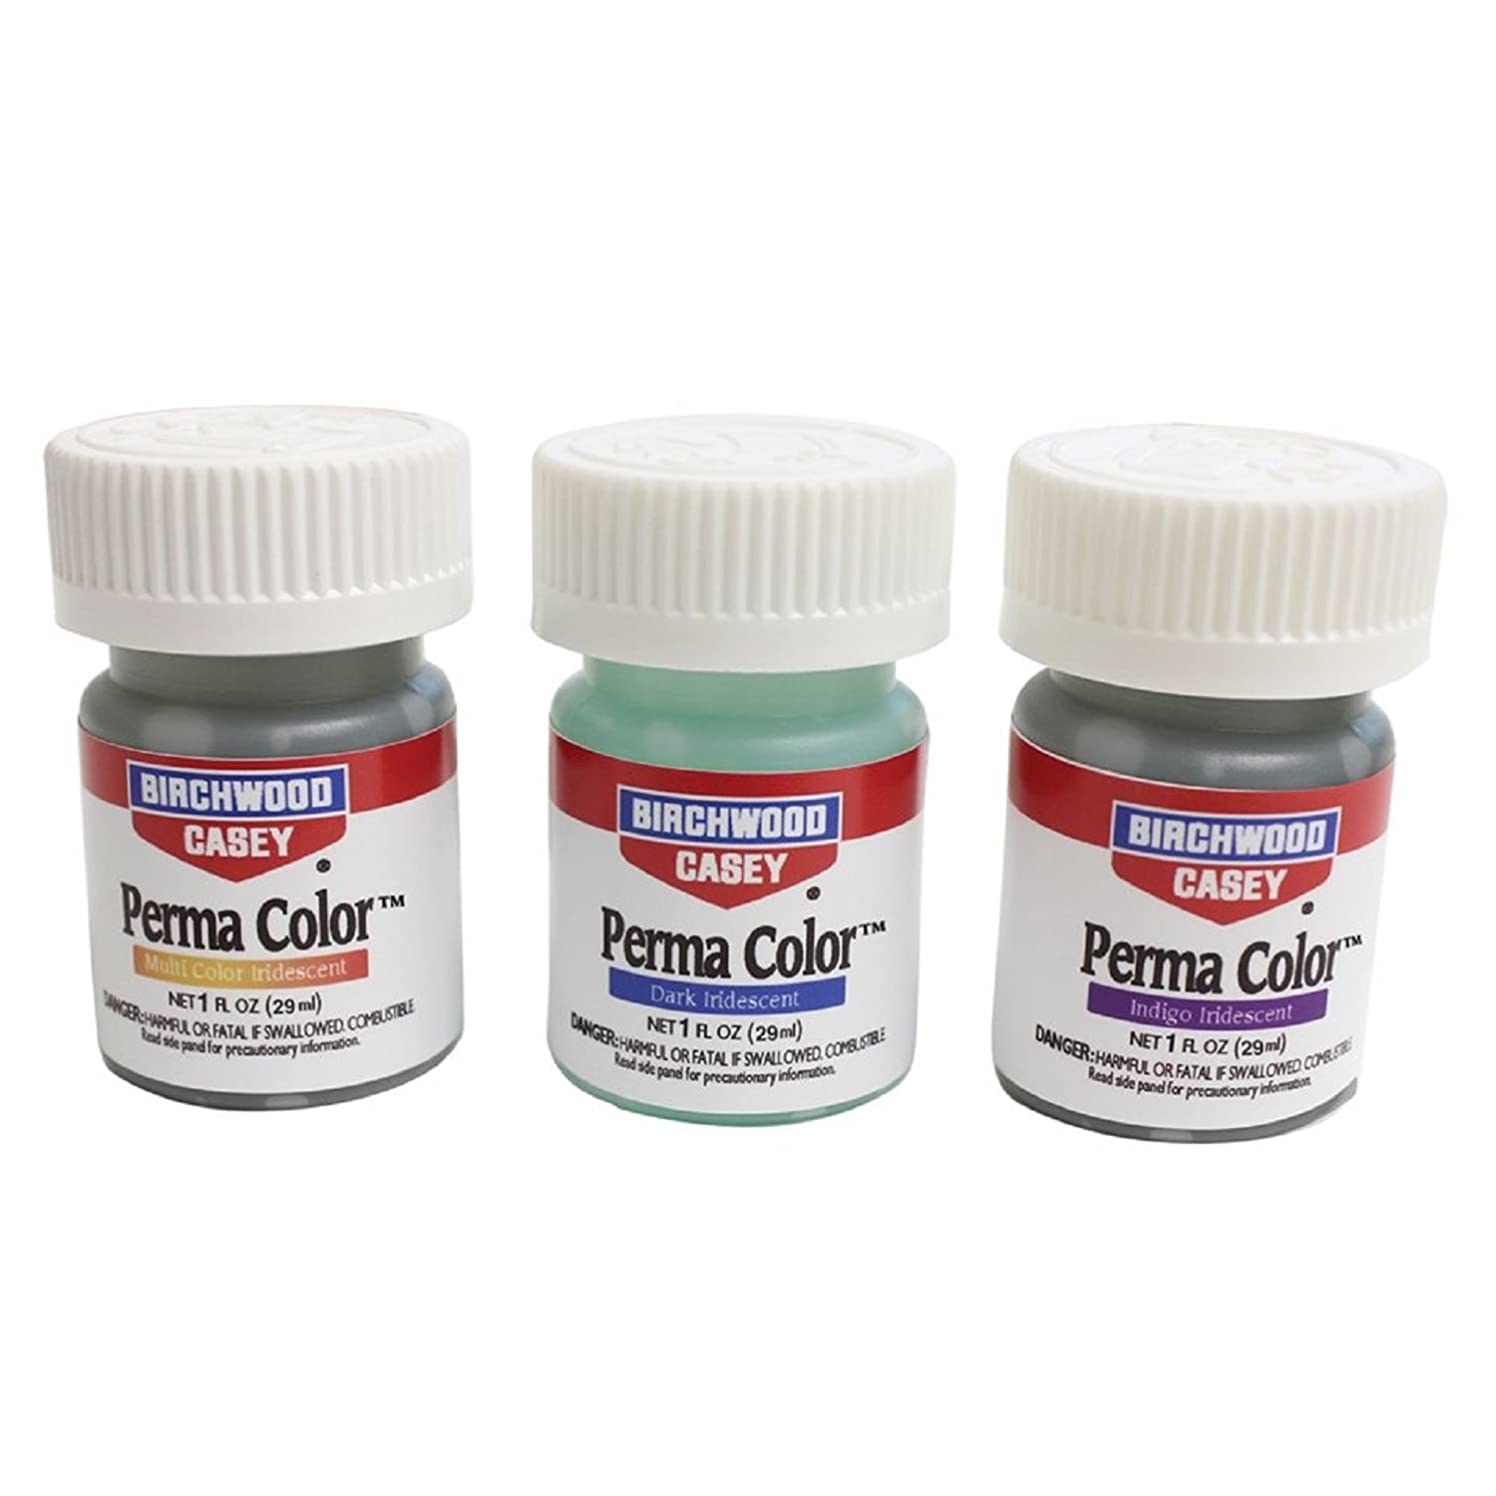 Birchwood Casey Perma Color Case Coloring Finishing Kit